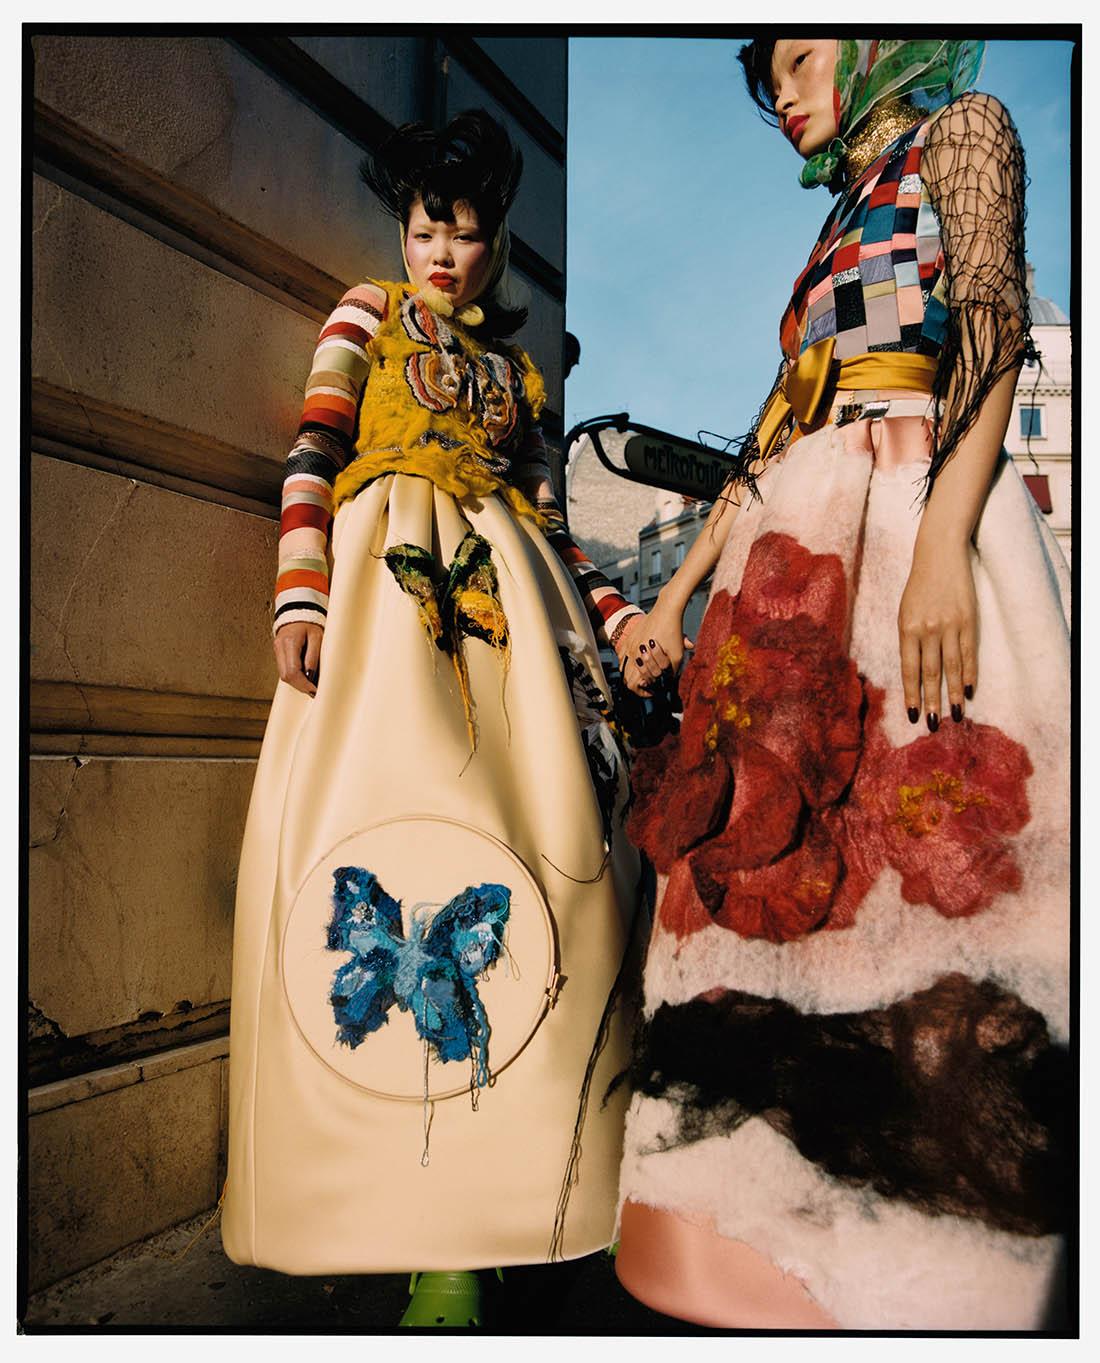 Chen Xue and Manami Kinoshita by Nadine Ijewere for Garage Magazine Fall Winter 2019